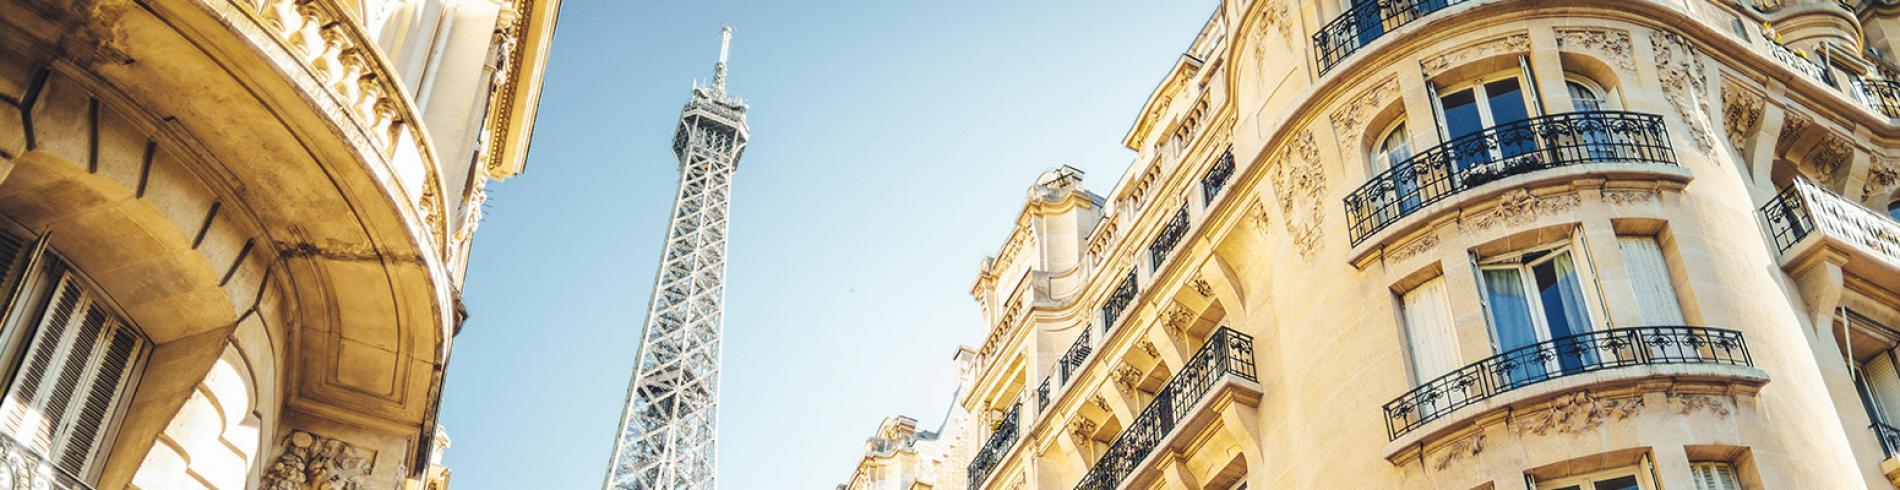 Paris street with Eiffel Tower